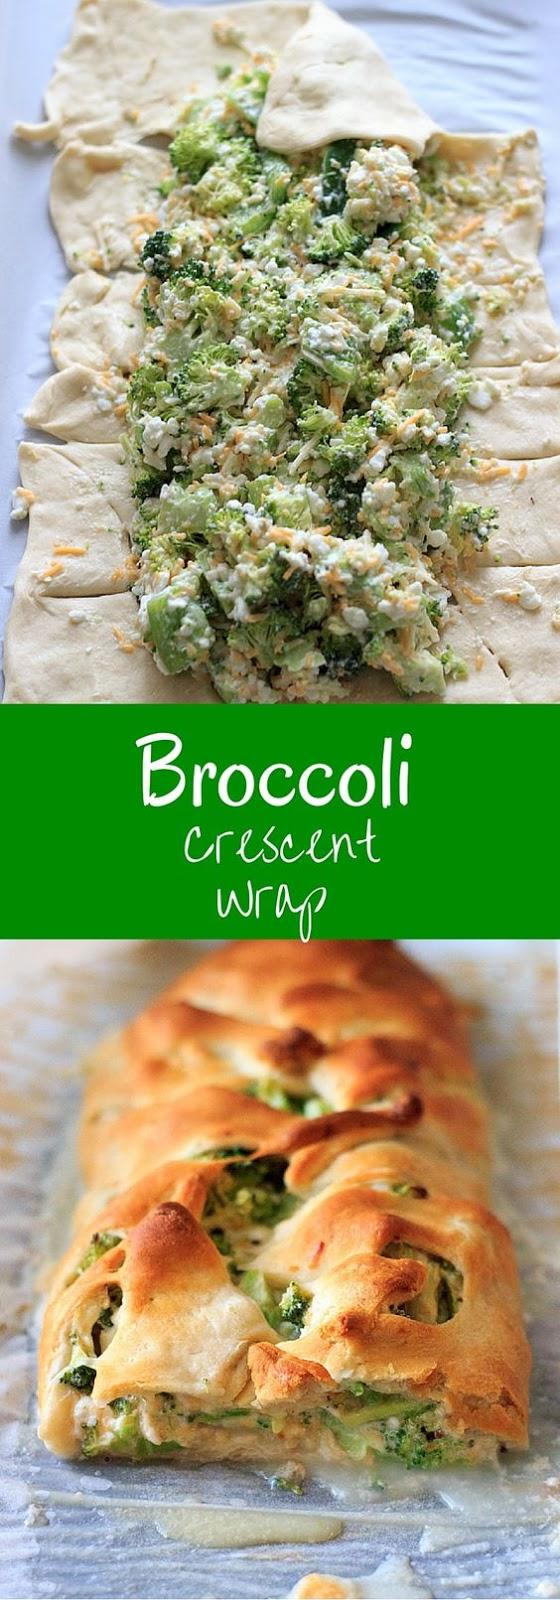 Broccoli crescent wrap